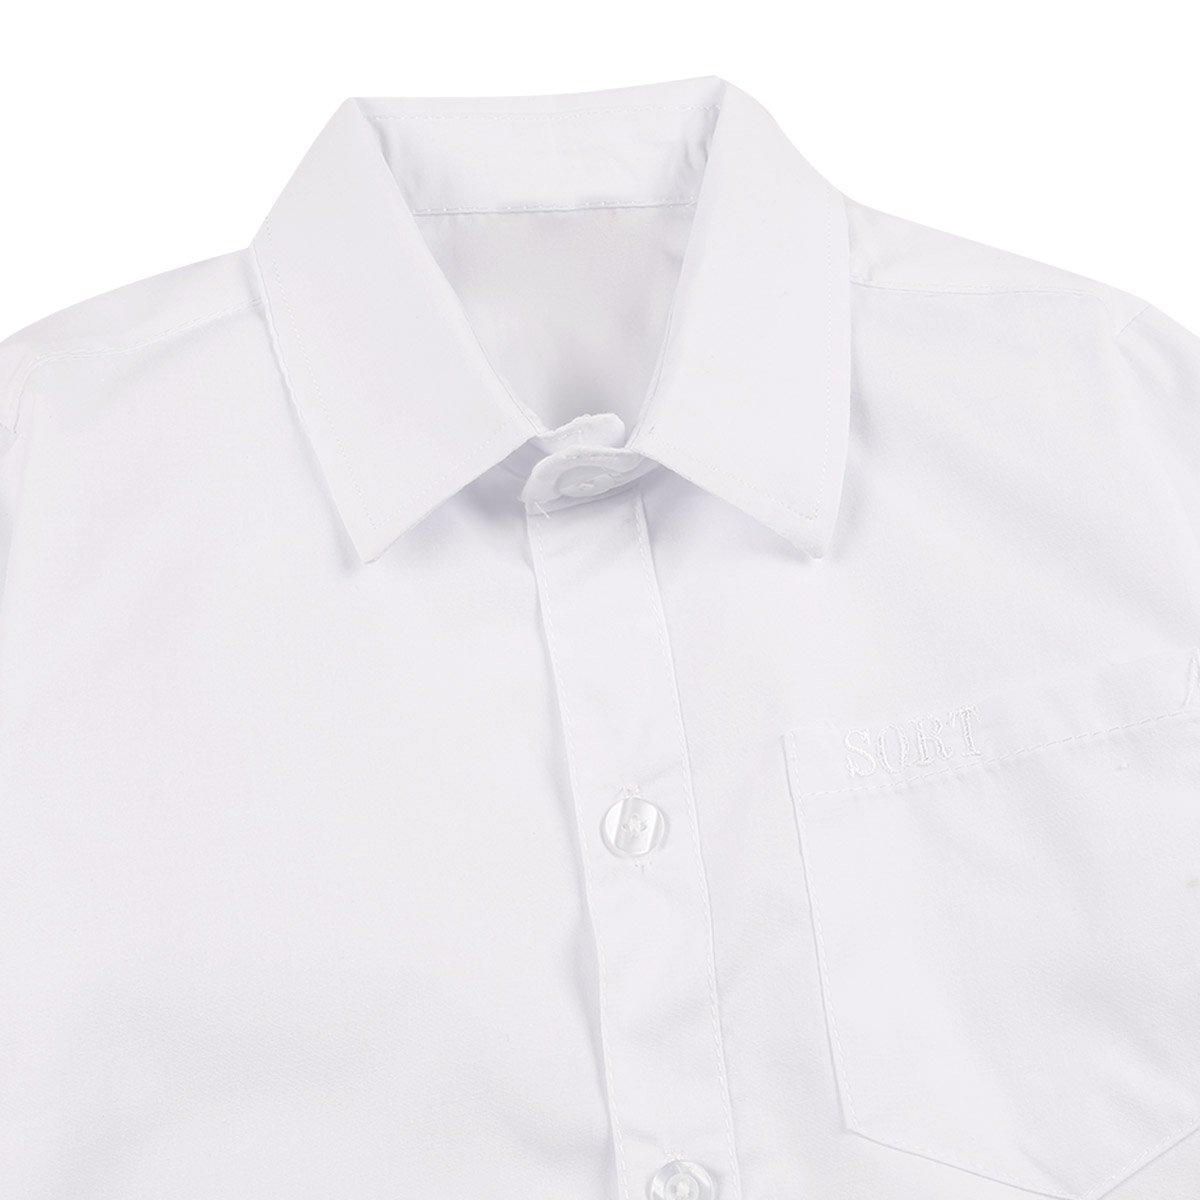 inlzdz Uniforme Escolar Niños Camisa Blanca Manga Larga Traje ...